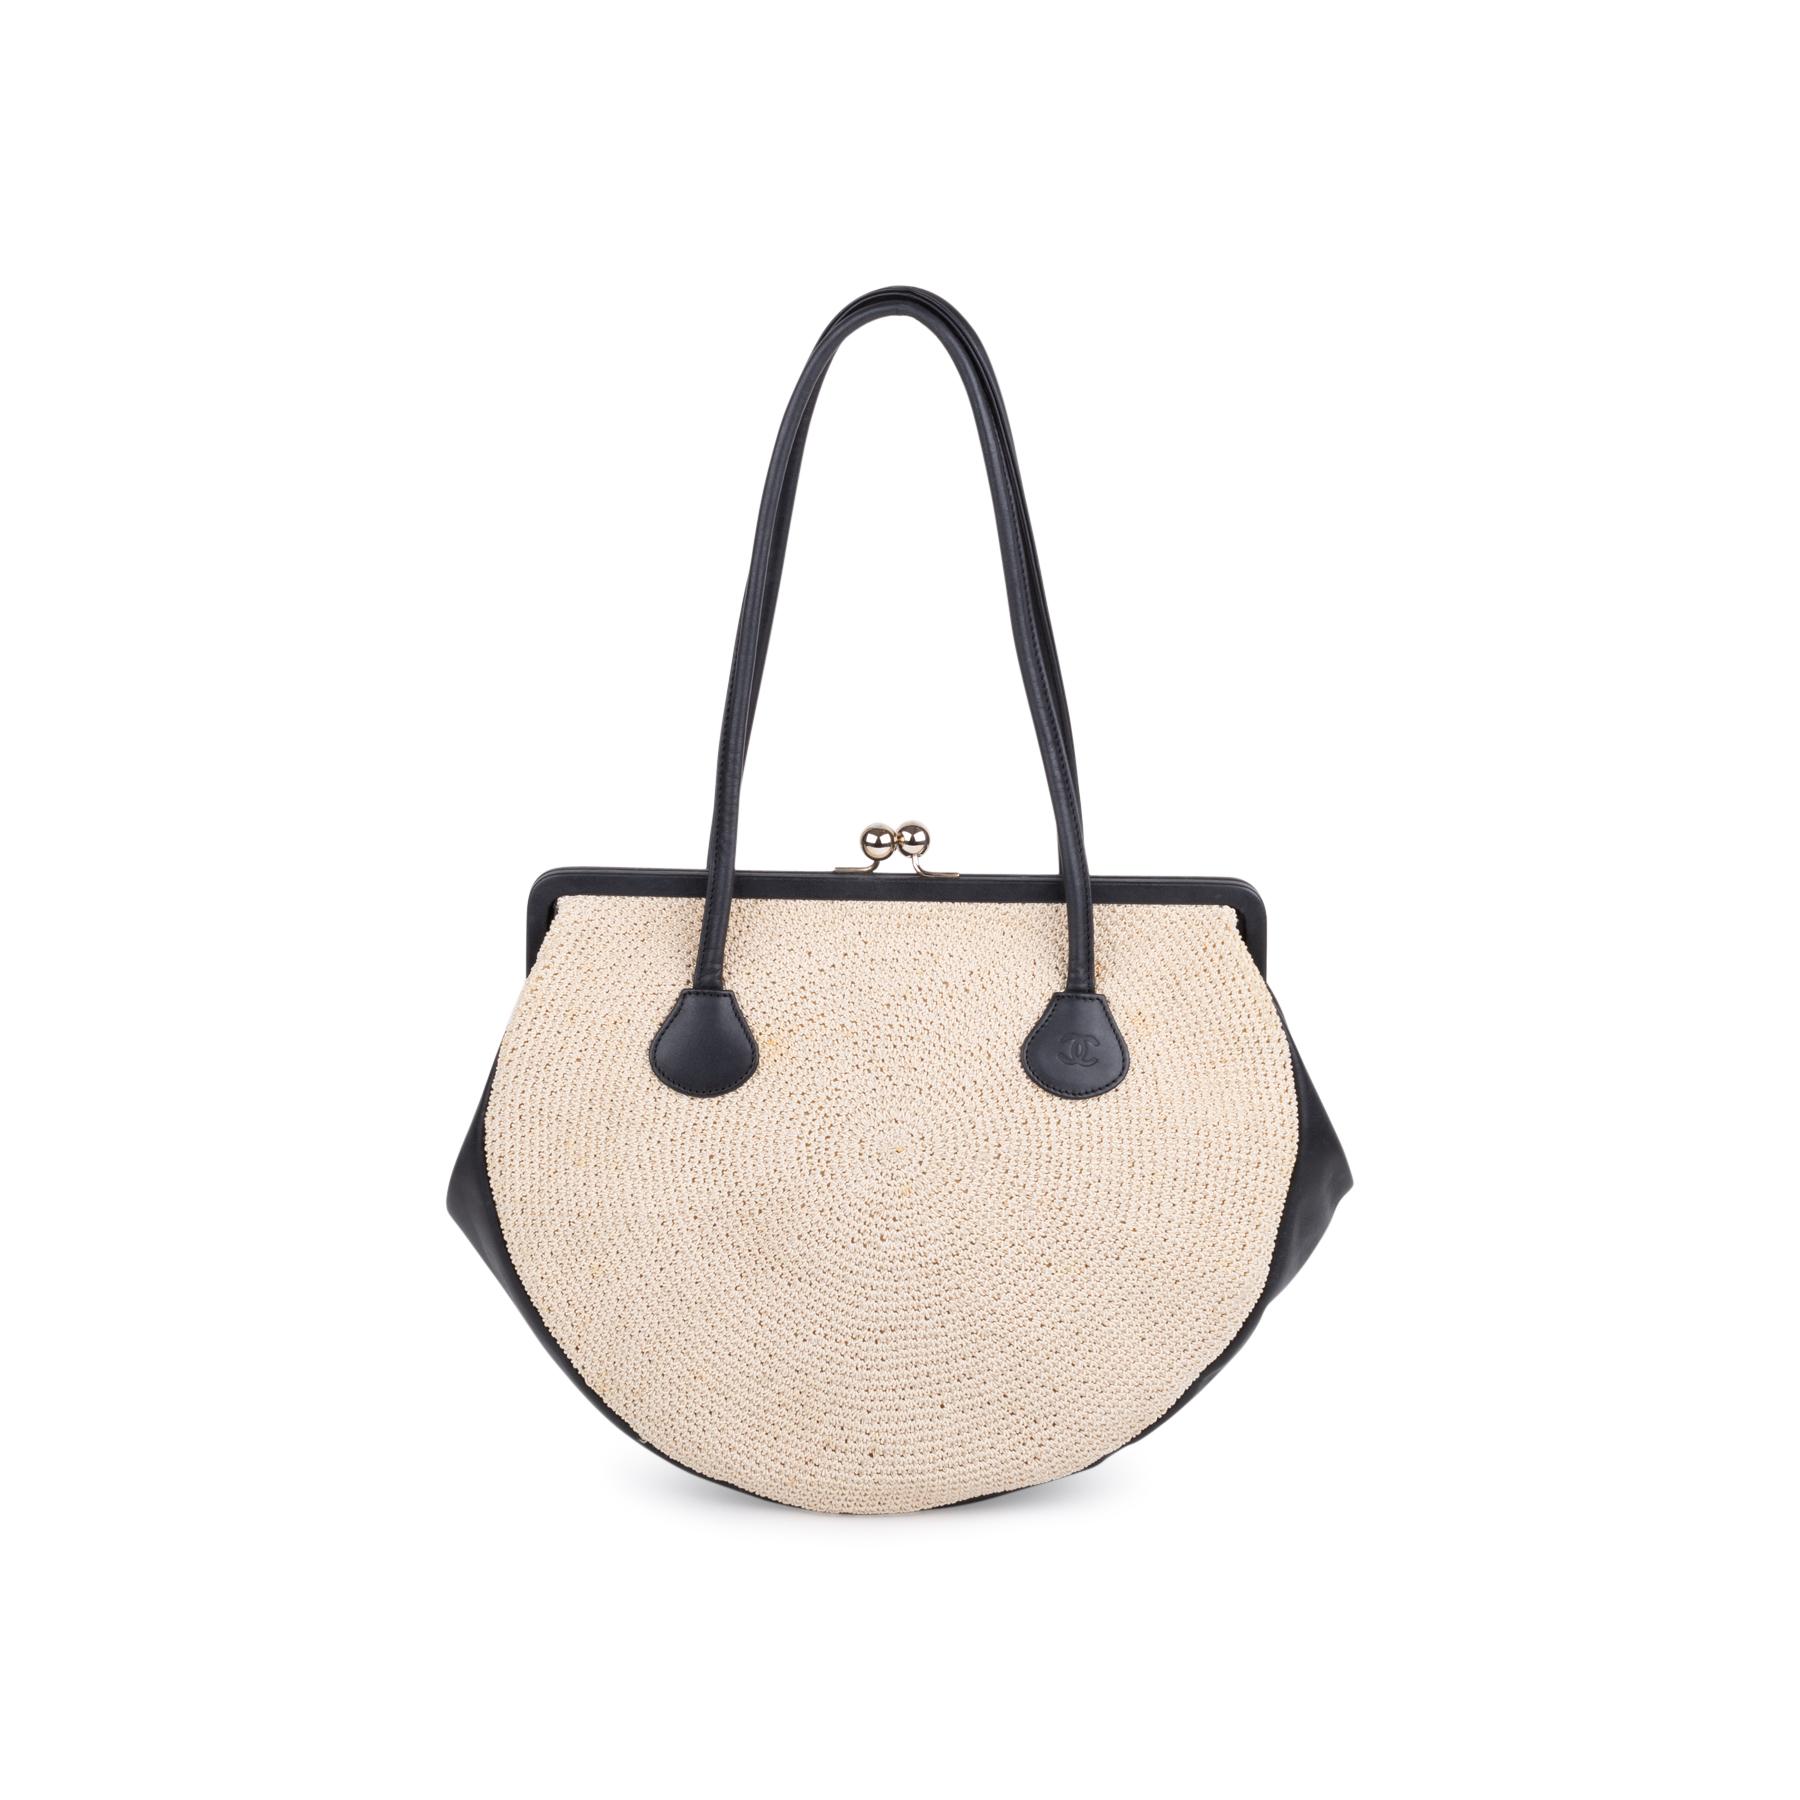 903b601f7118 Authentic Second Hand Chanel Woven Kiss Lock Handbag (PSS-606-00015 ...